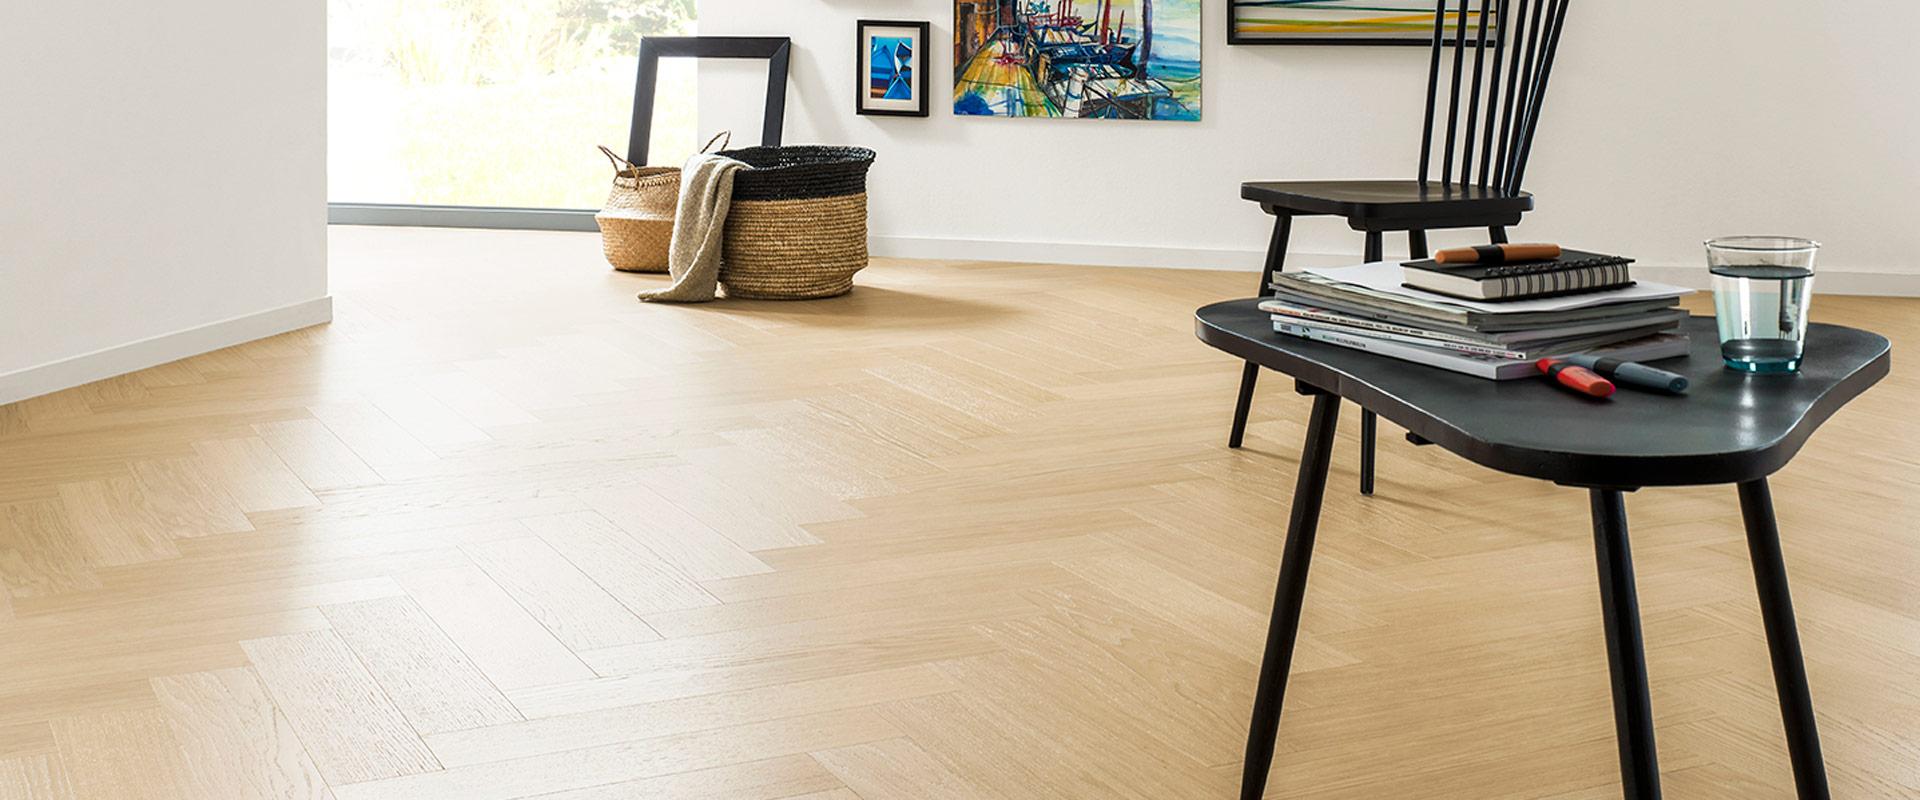 Lichte houten vloer pvc visgraat Vloerenland